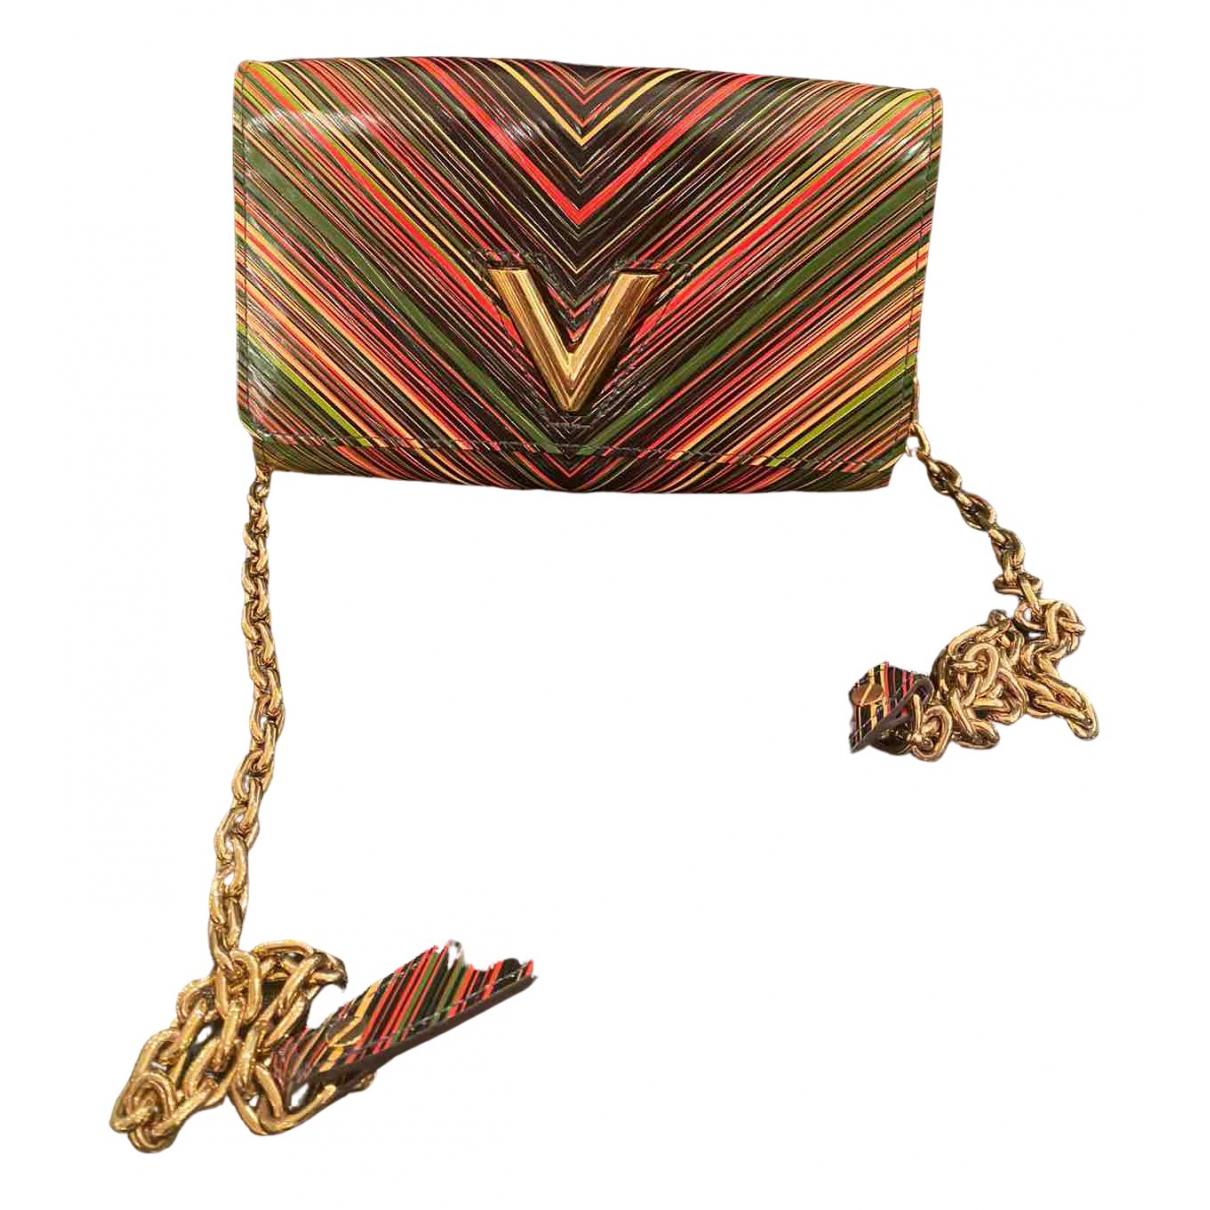 Louis Vuitton Twist Clutch in Leder